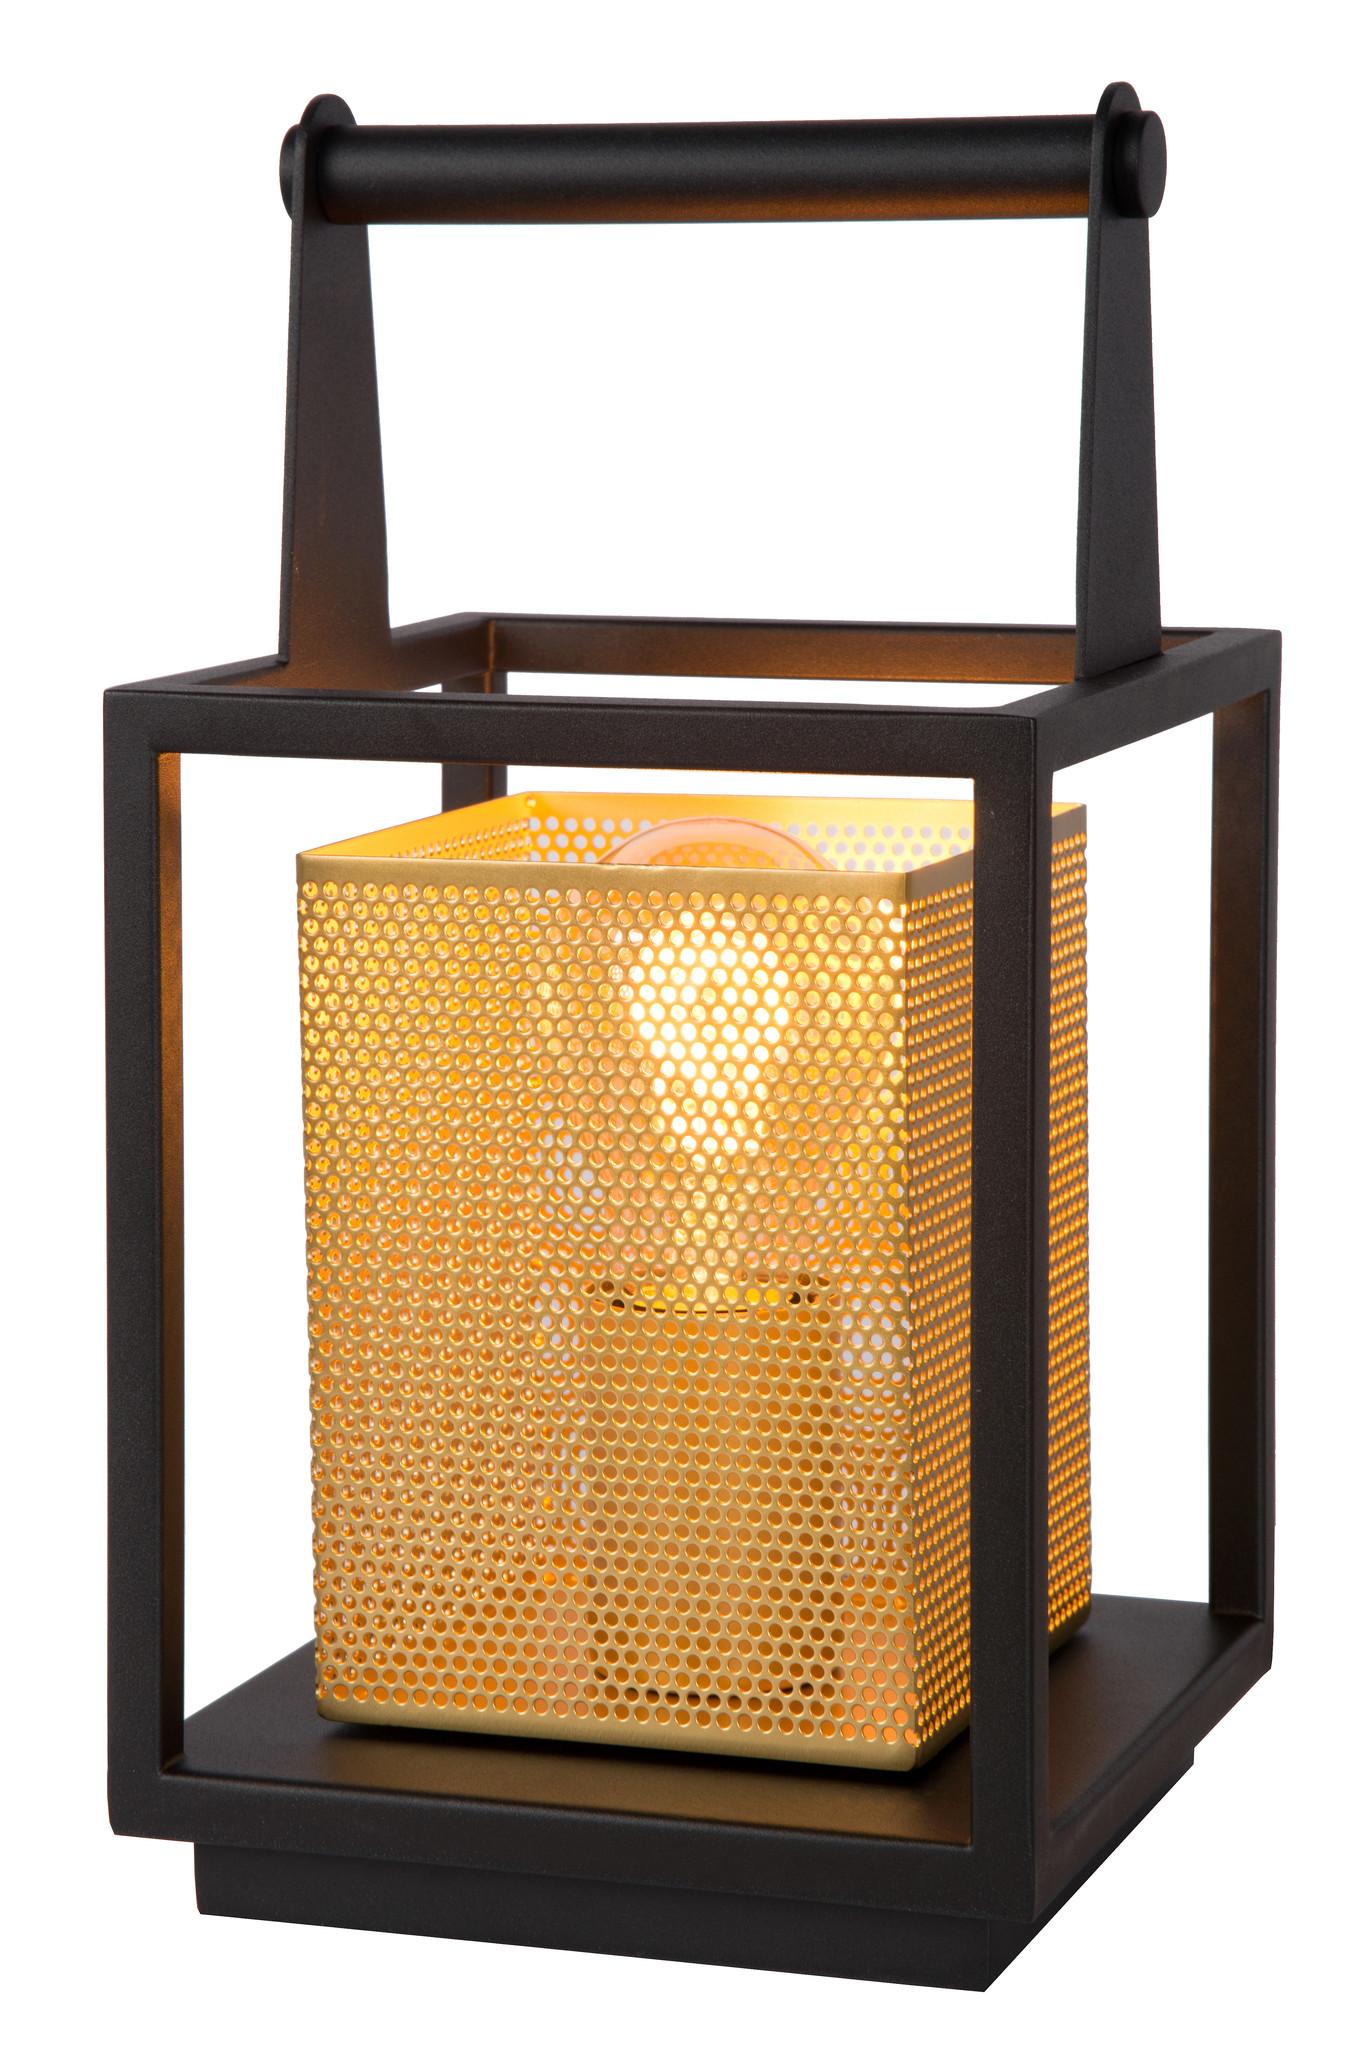 Lucide SANSA Tafellamp-Zwart-1xE27-40W-Metaal